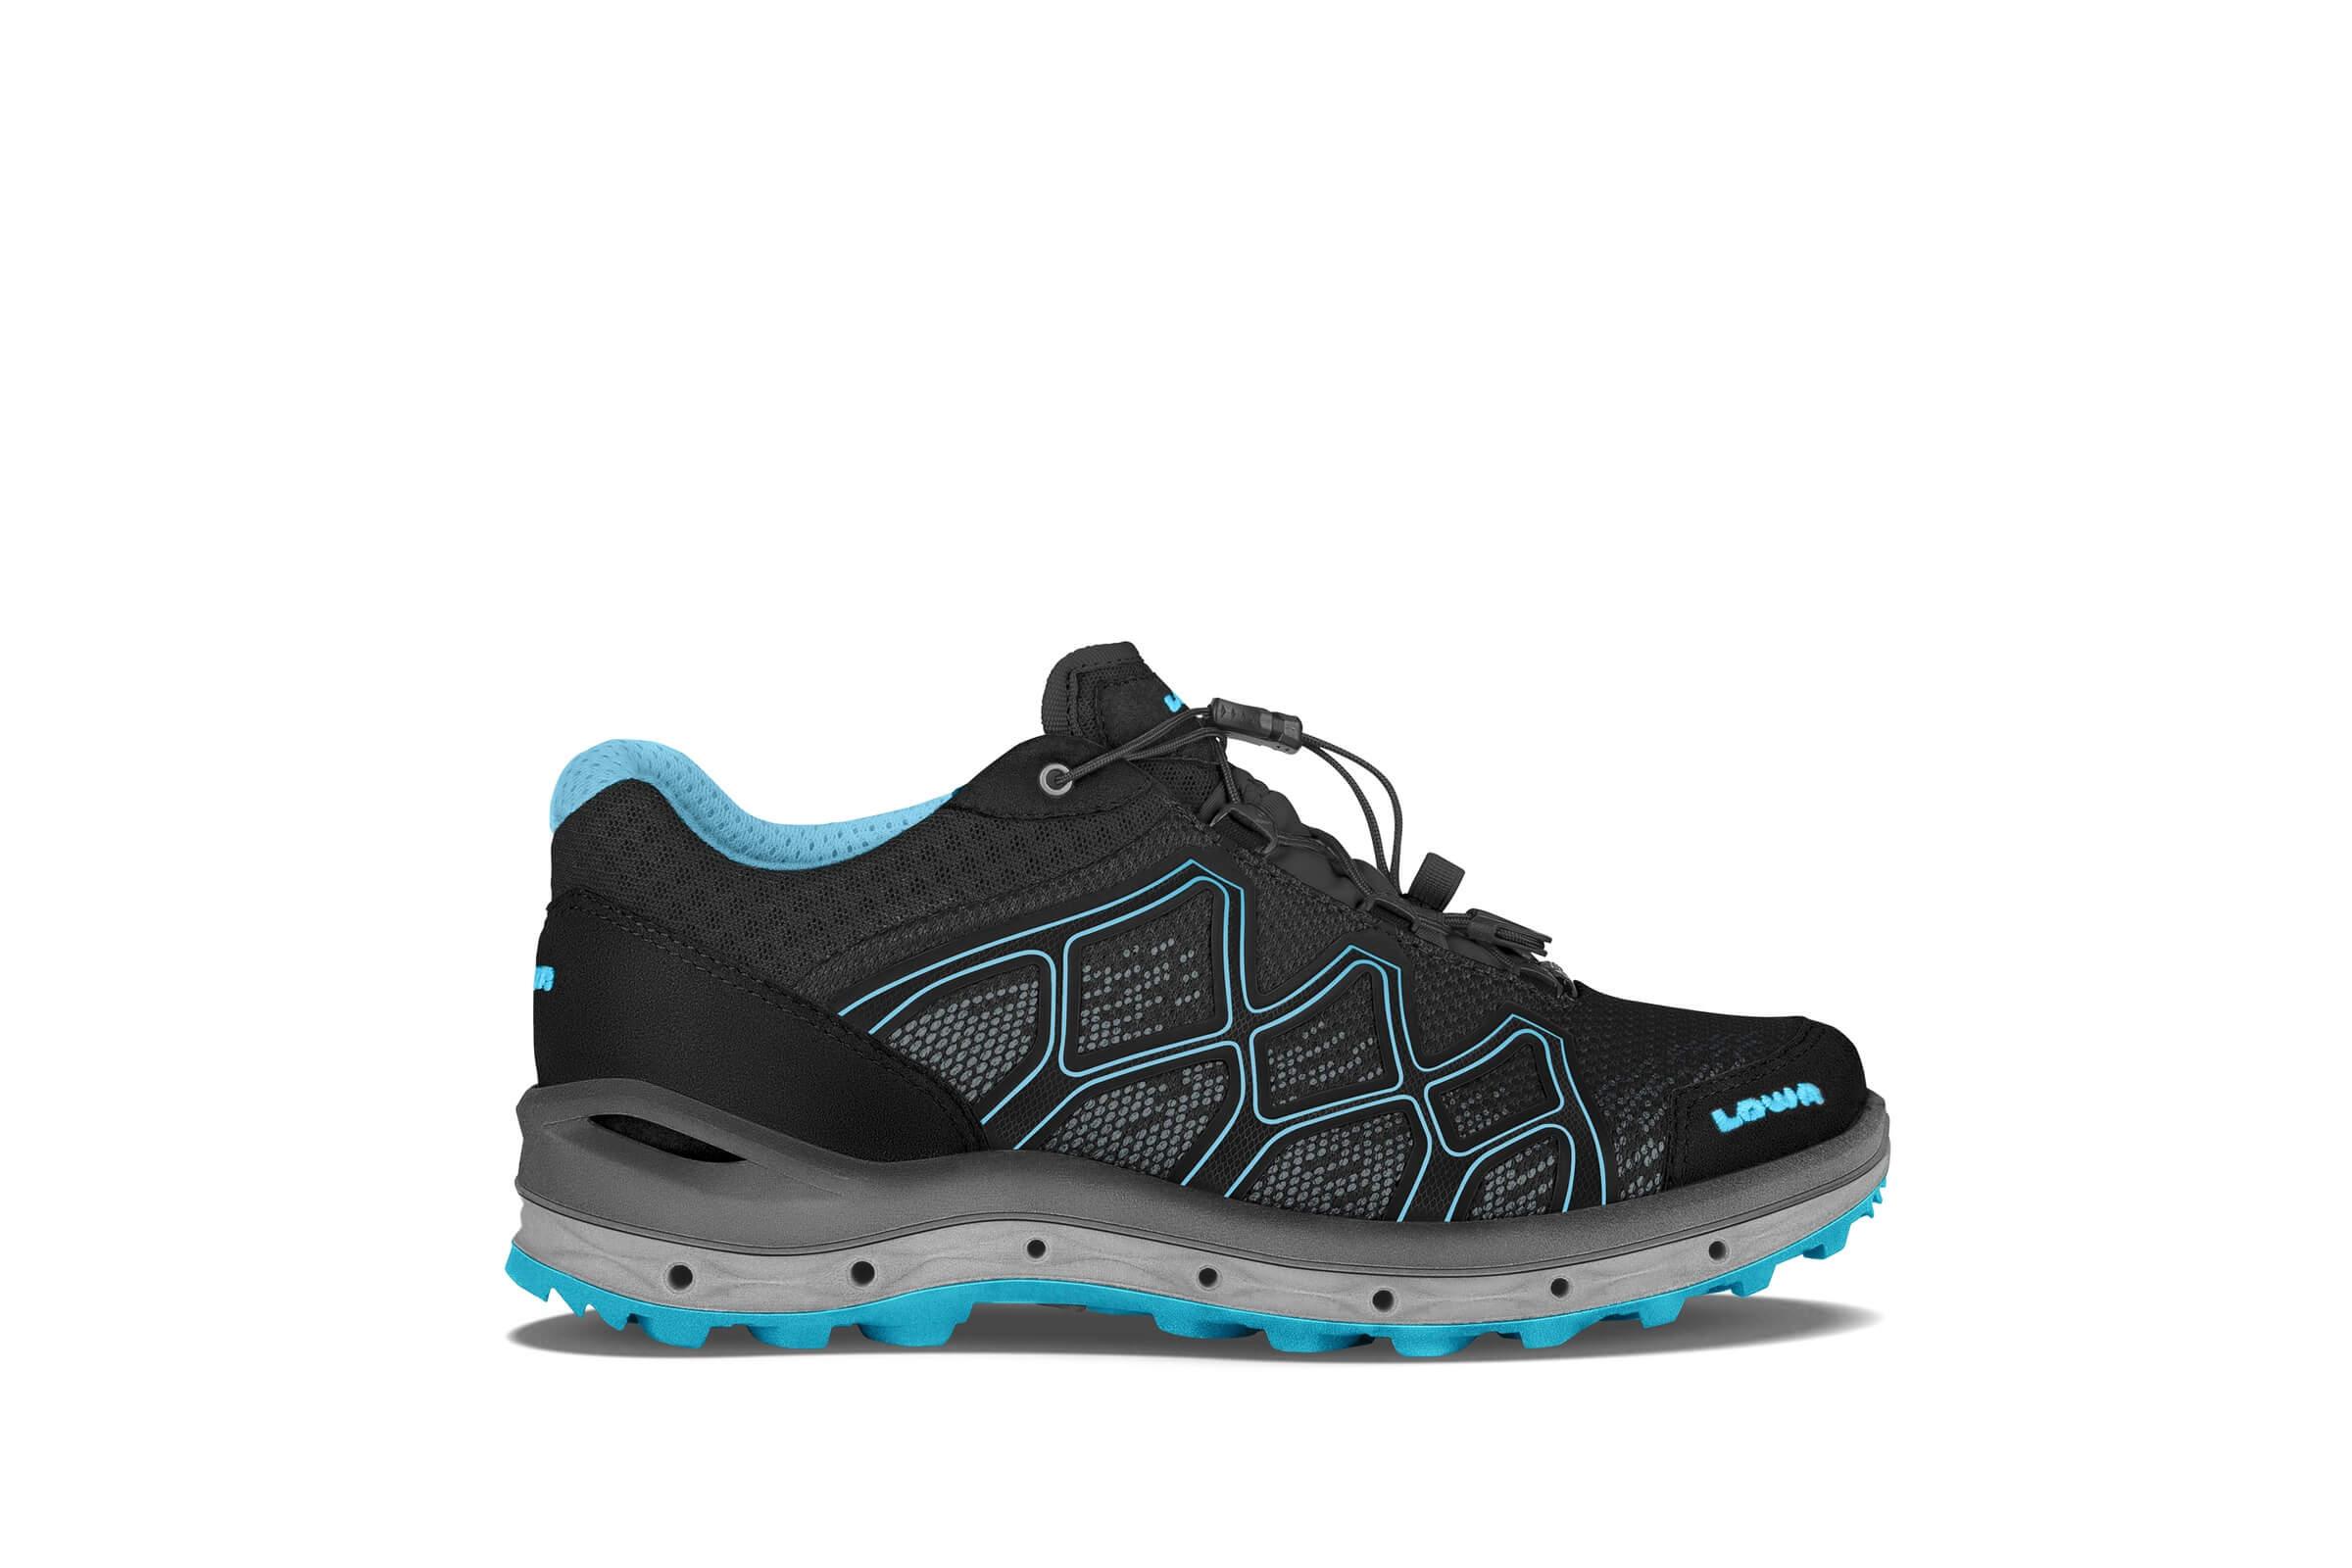 separation shoes 249e2 1edac GORE Tex Schuhe | INTERSPORT